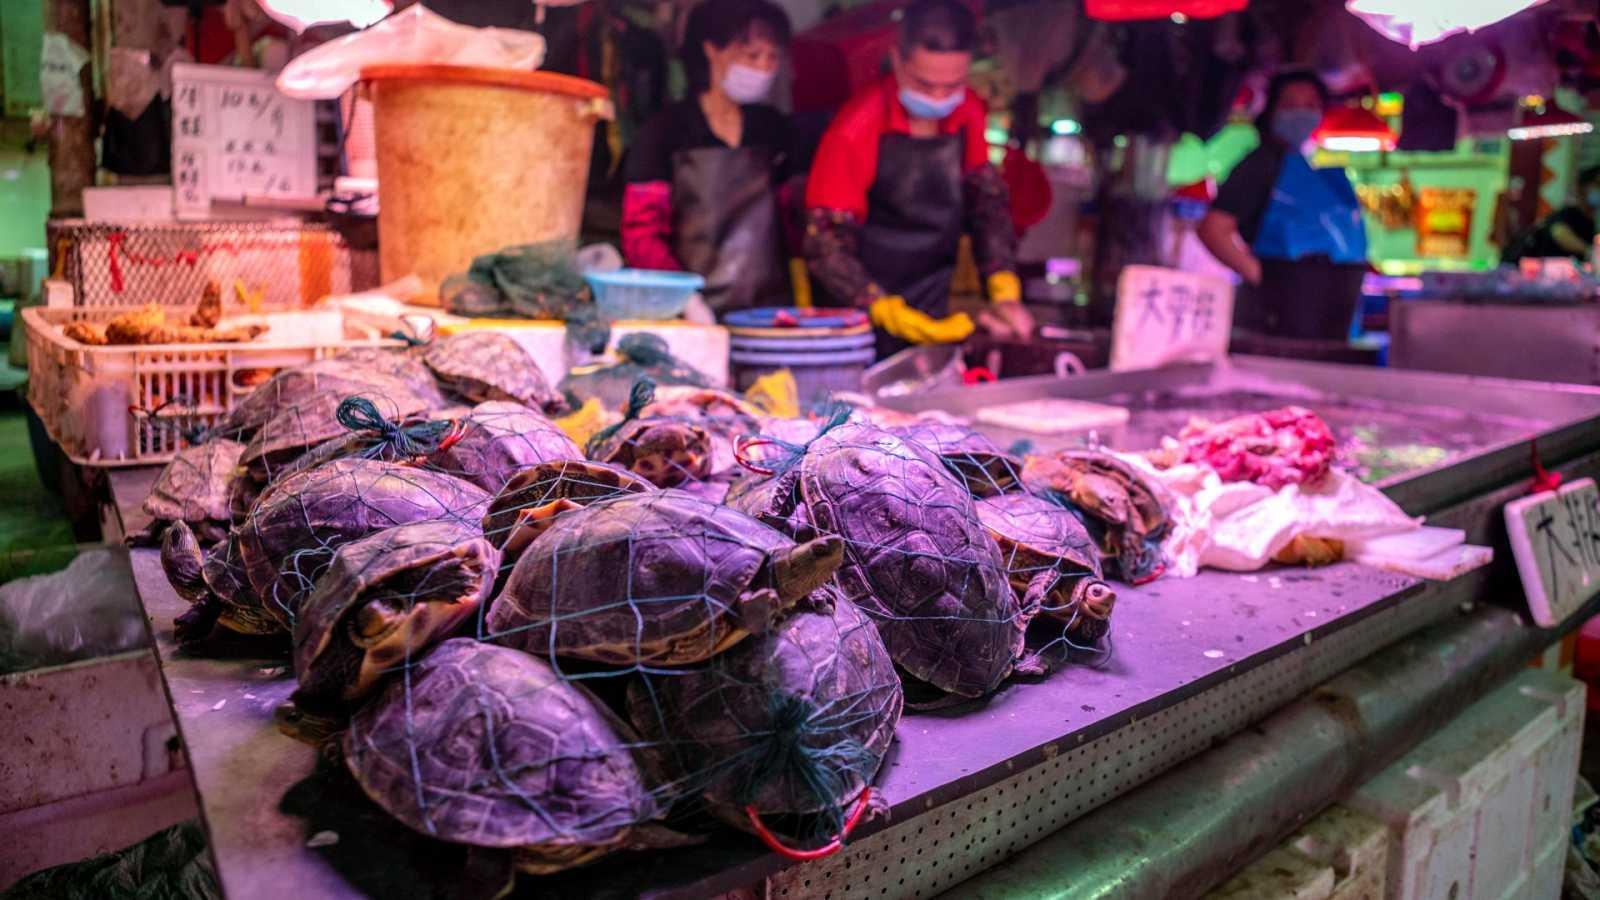 Venta de tortugas vivas en el mercado de agricultores de Xihua en Guangzhou, provincia de Guangdong, China